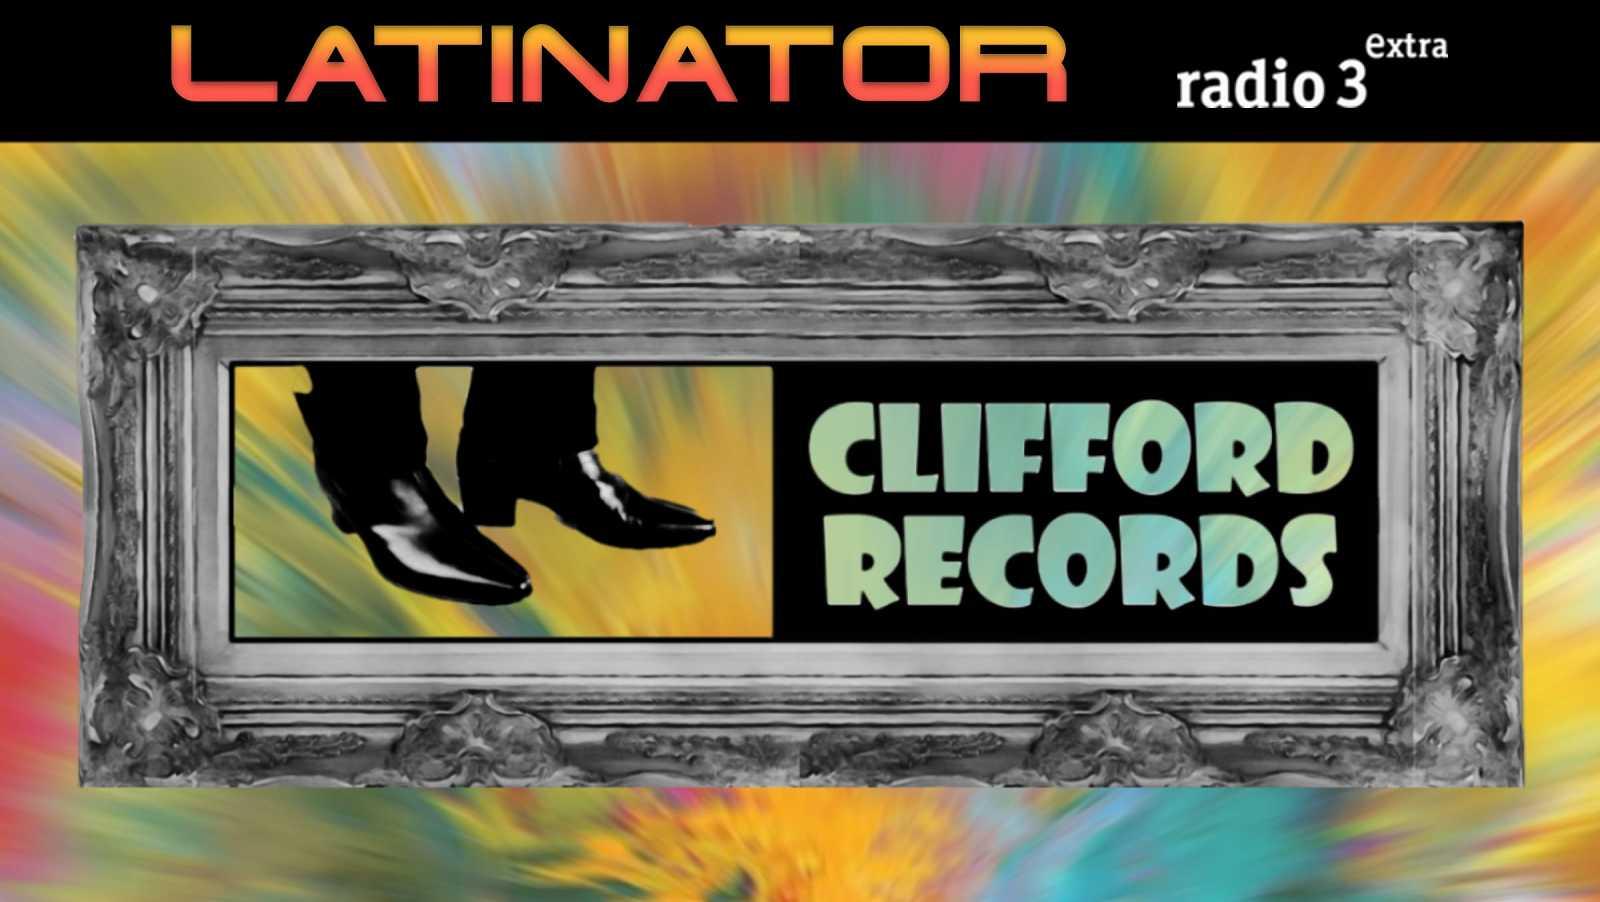 Latinator - CLIFFORD RECORDS I - 26/03/20 - escuchar ahora